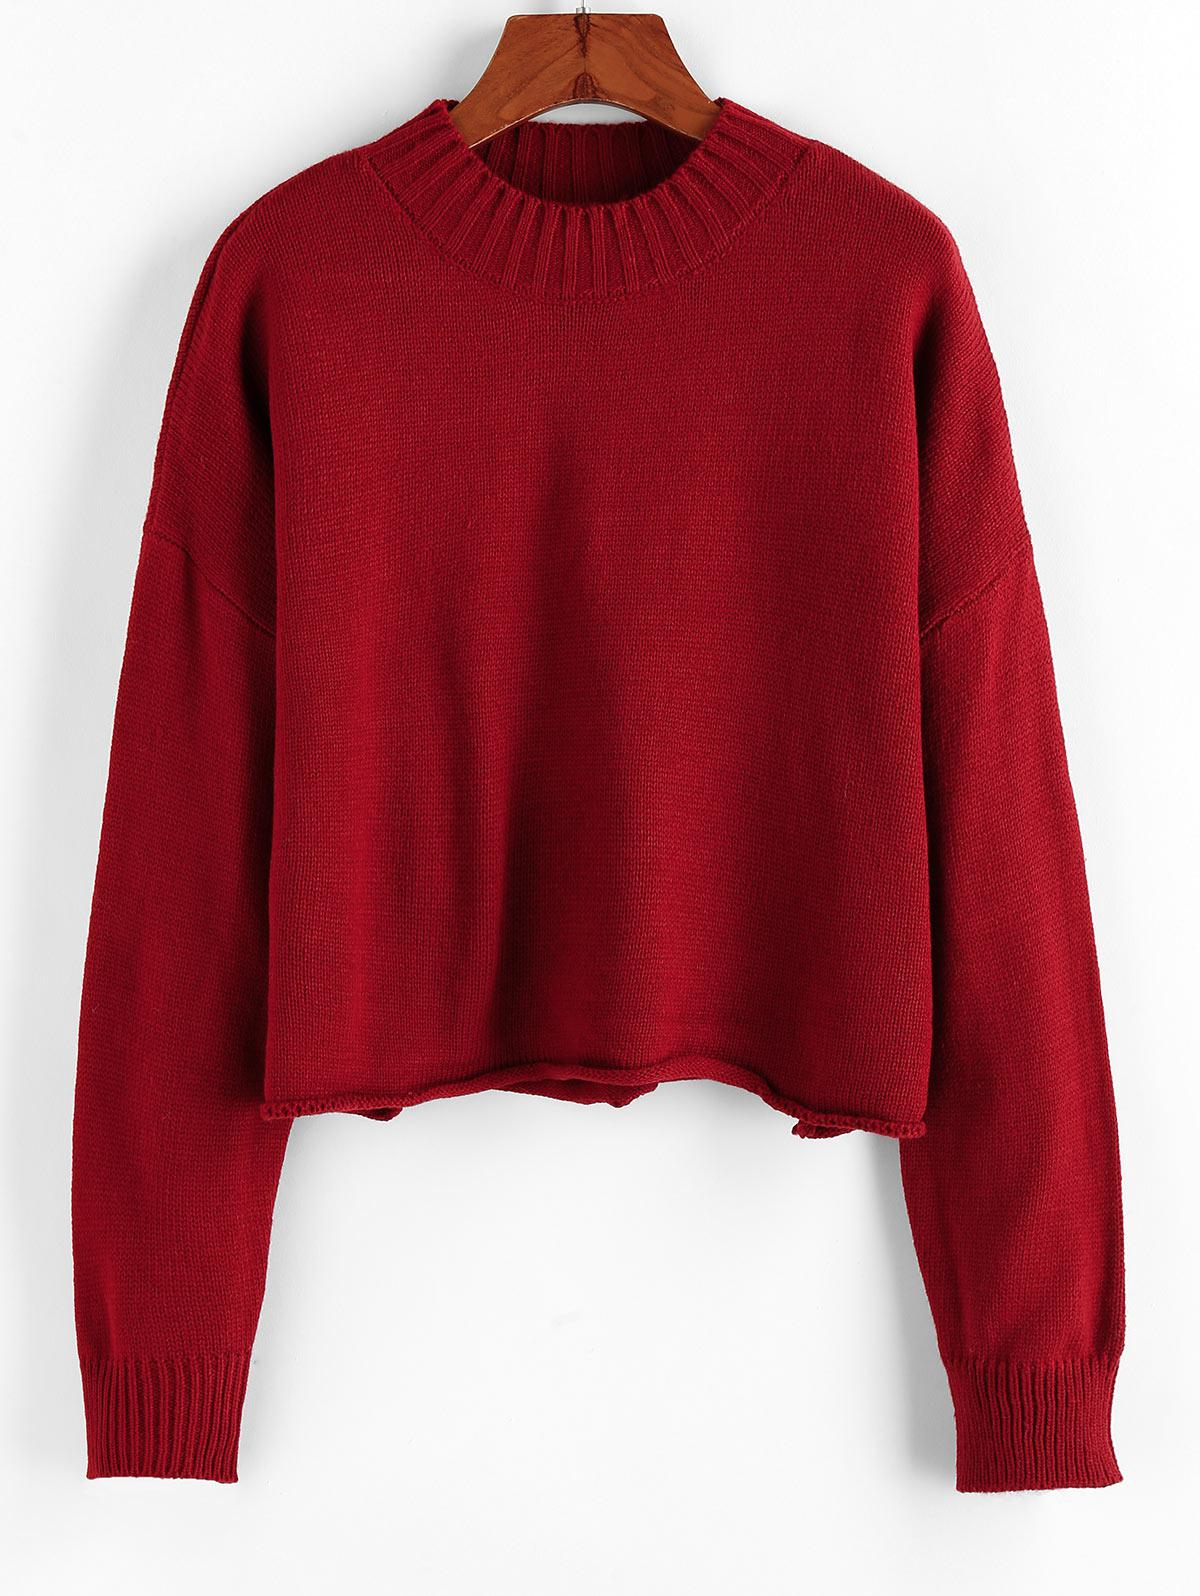 ZAFUL Drop Shoulder Rolled Hem Sweater